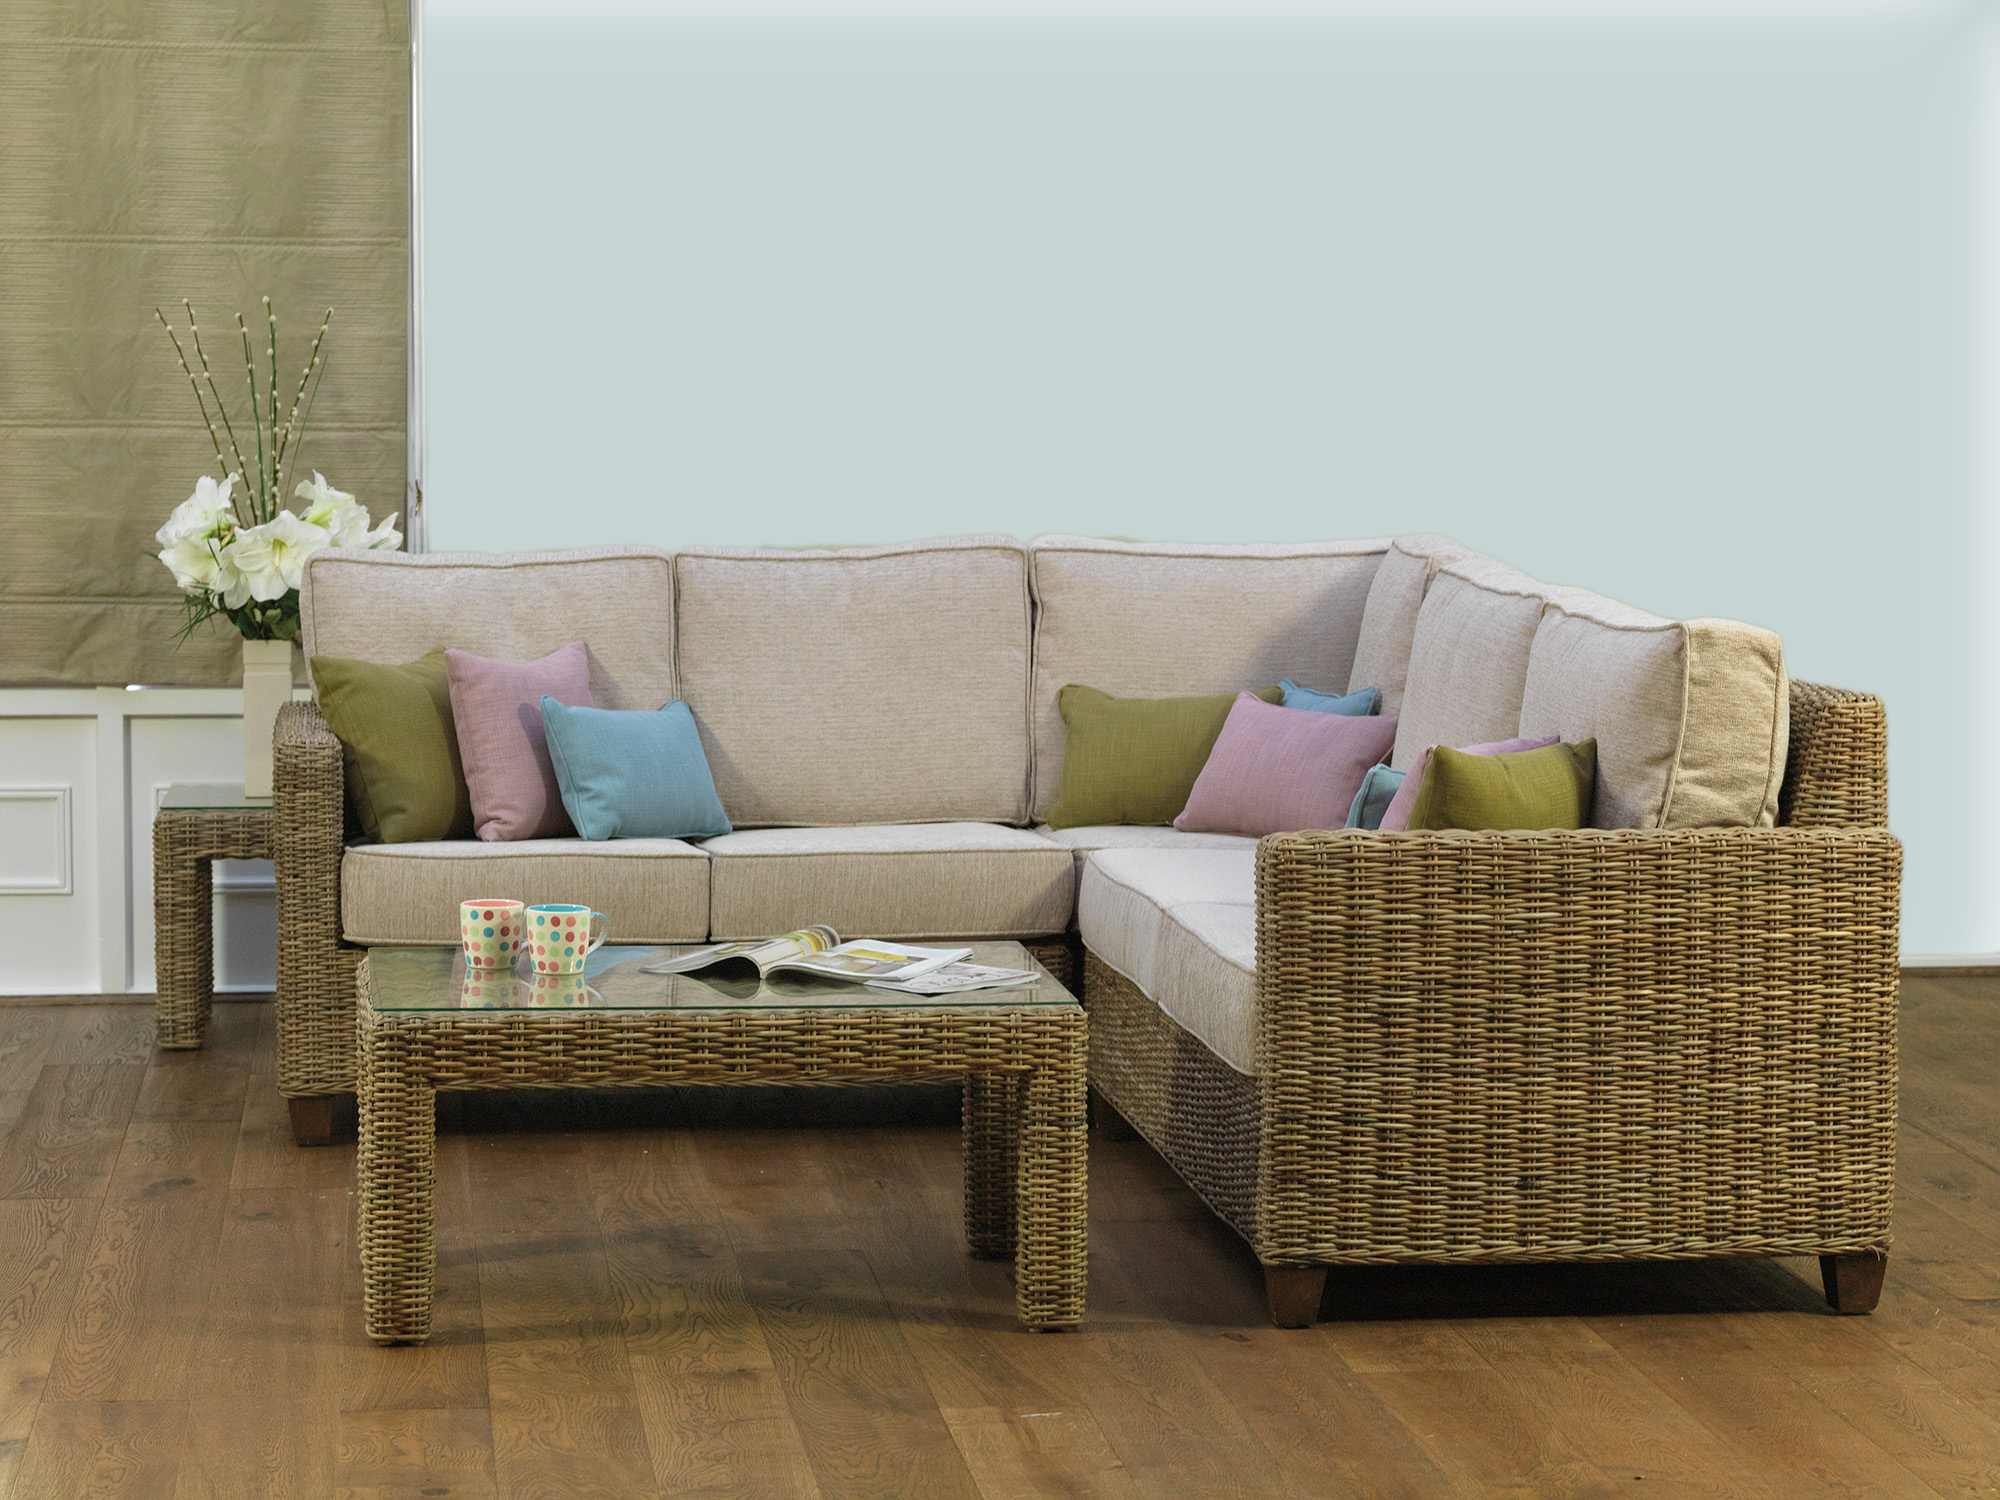 Abington Modular Daro Cane Furniture Rattan Furniture